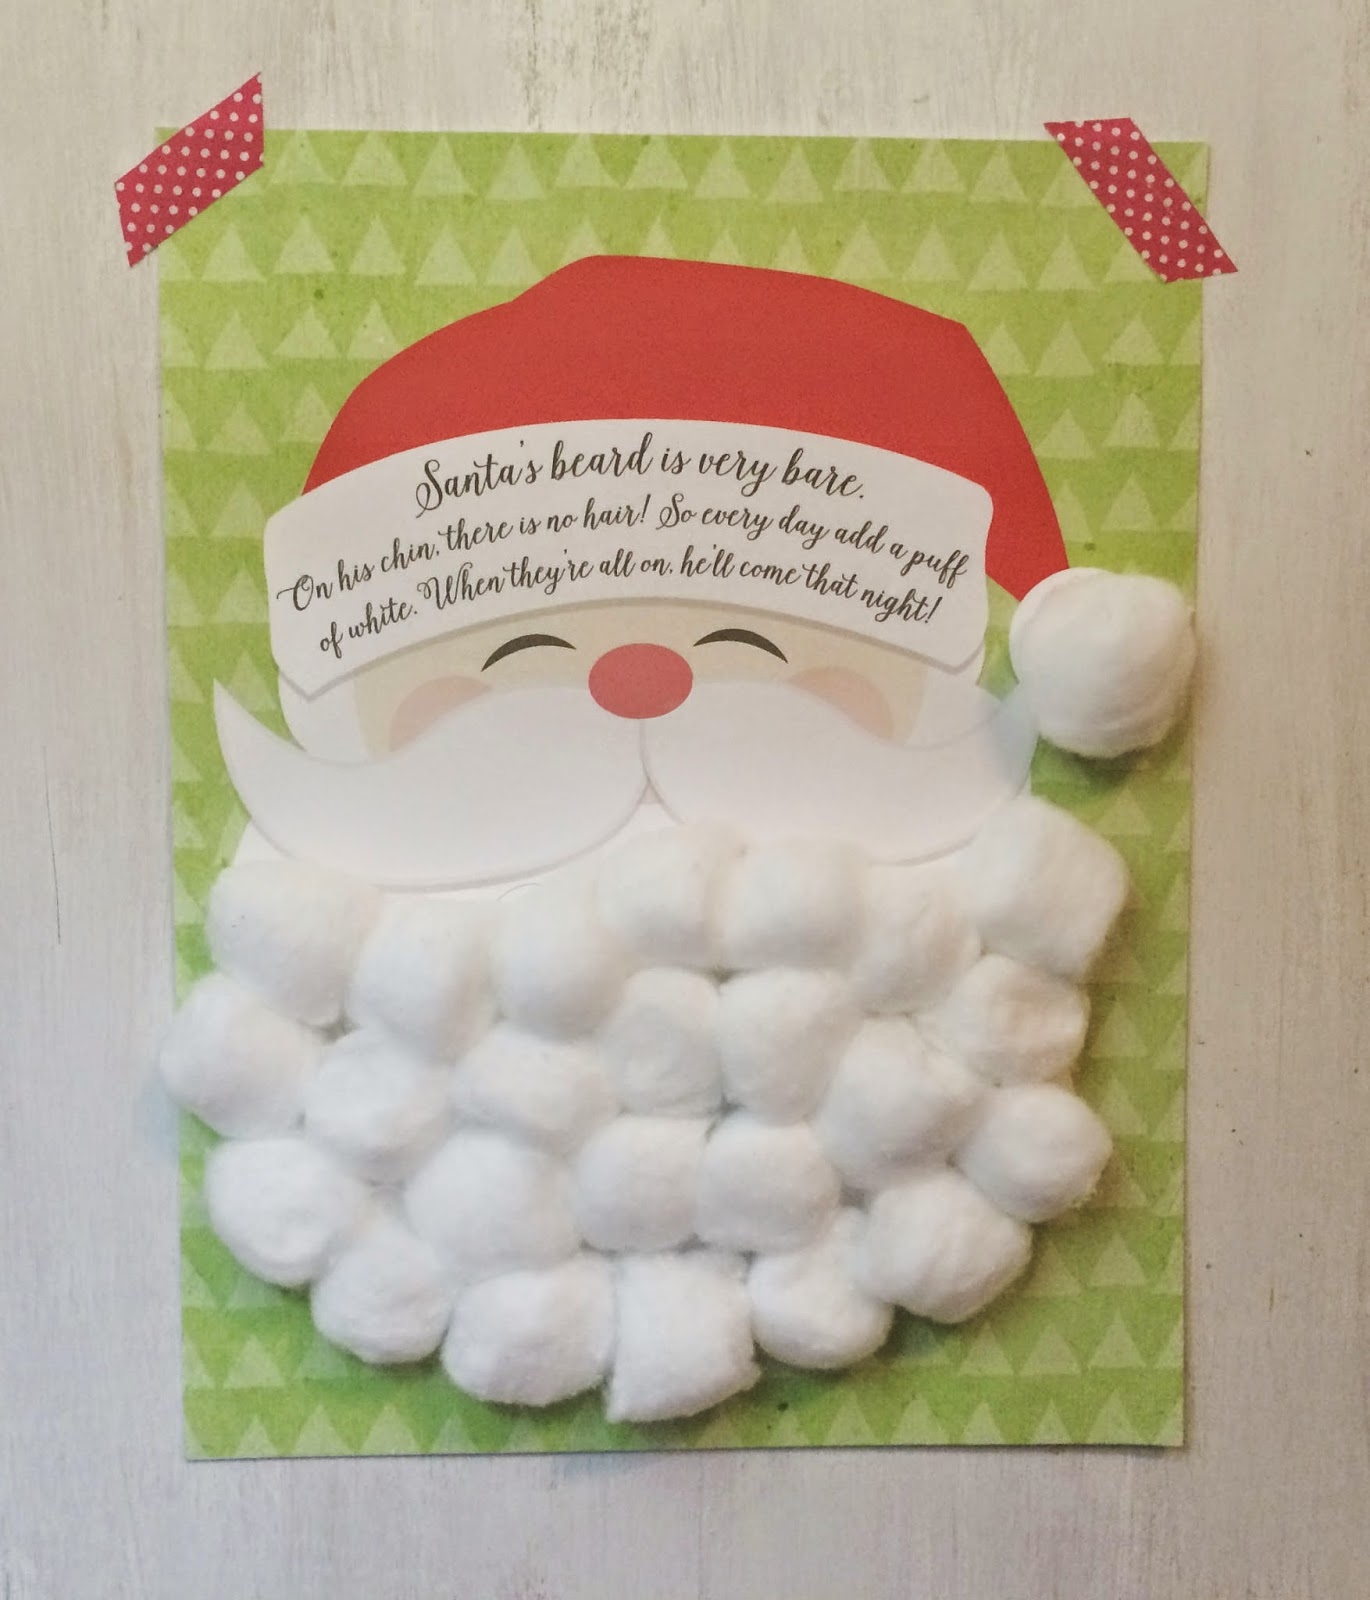 c313793be42 Free Printable  Santa Claus Beard Countdown Calendar